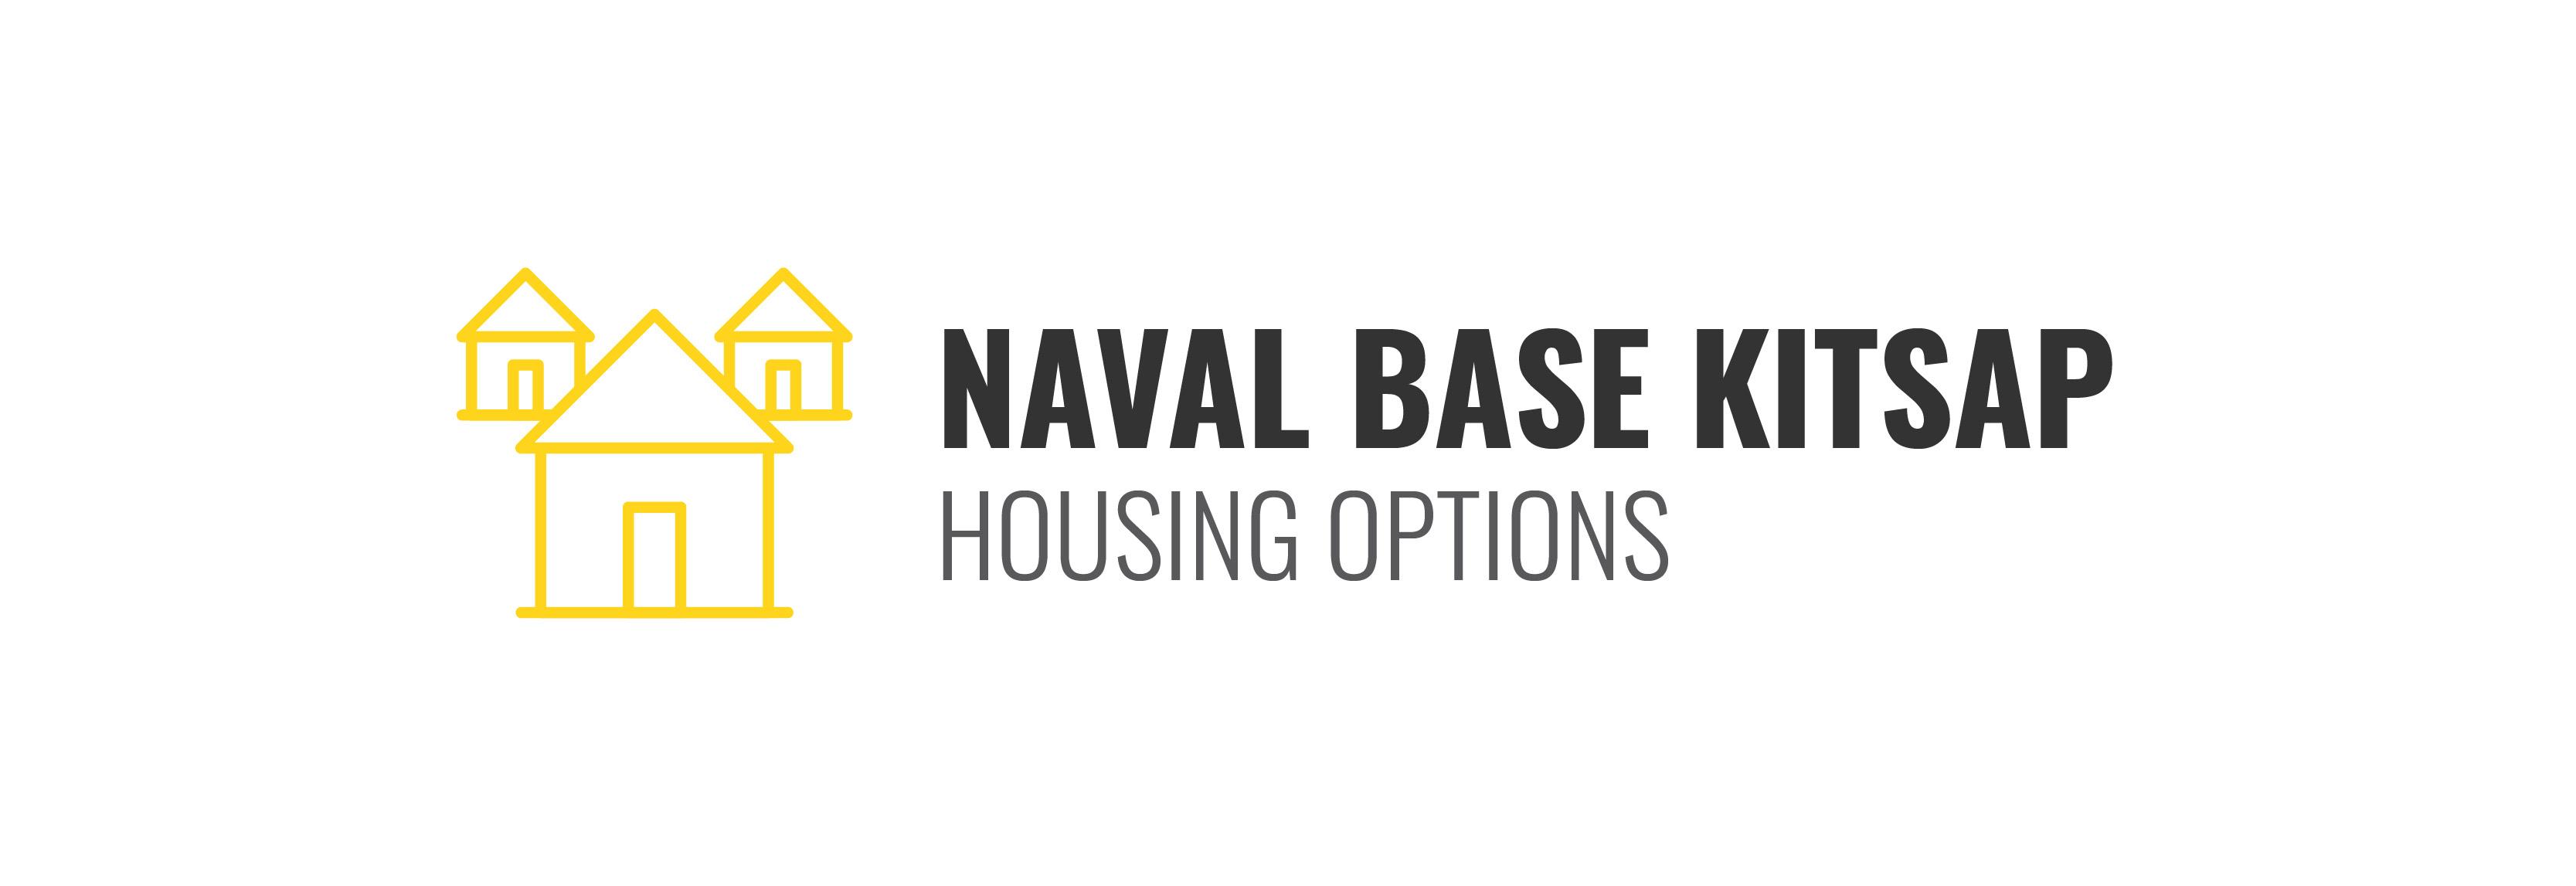 Naval Base Kitsap Housing Options